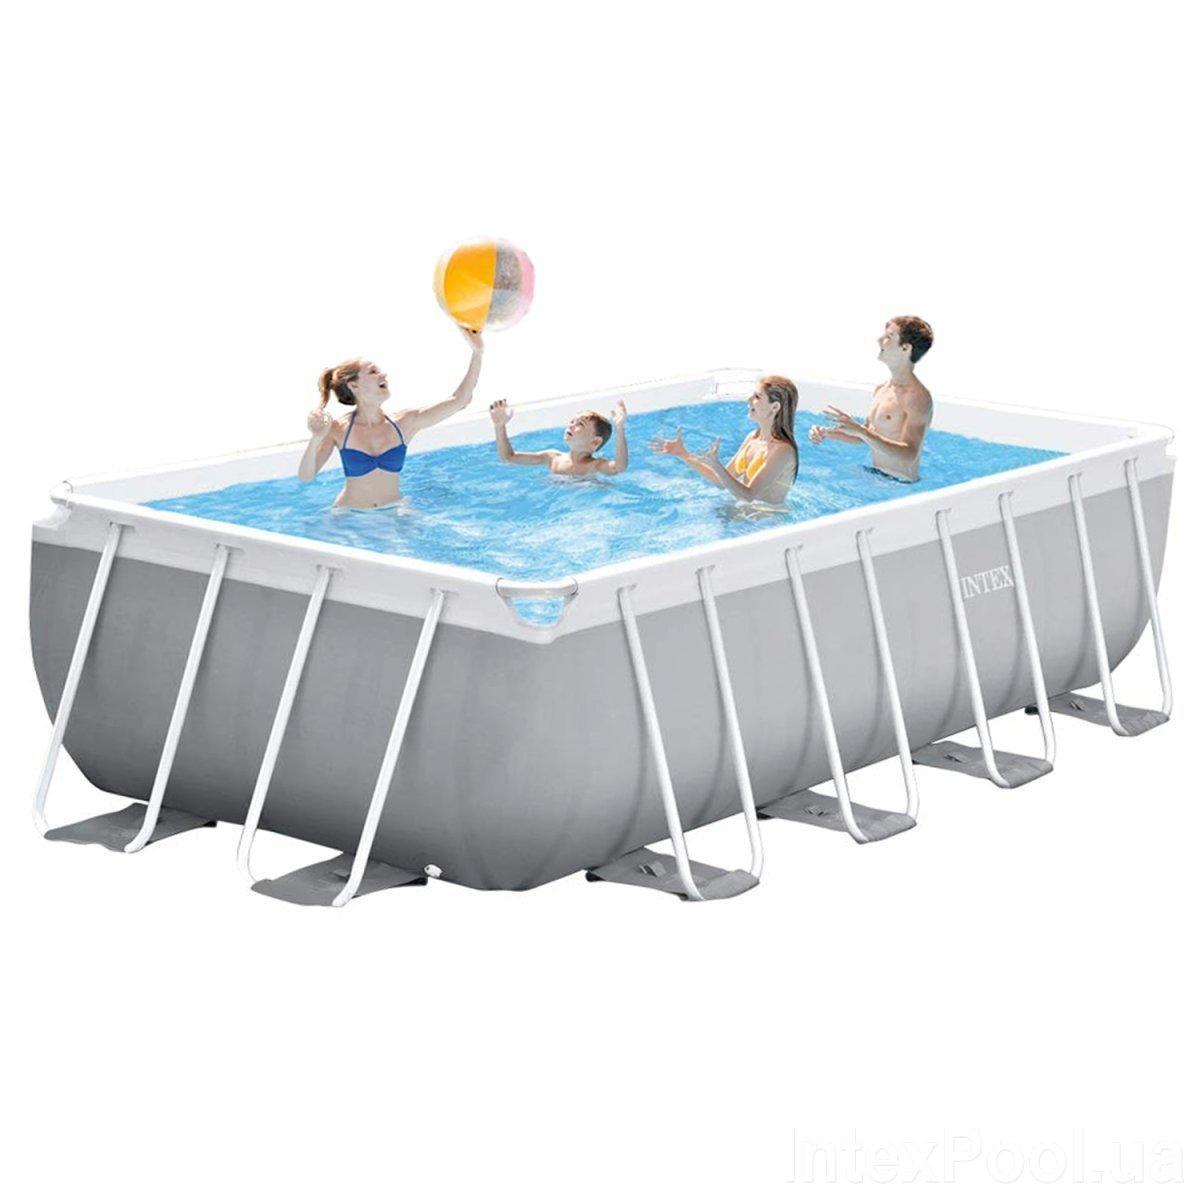 Каркасный бассейн Intex 26792 - 0, 488 x 244 x 107 см